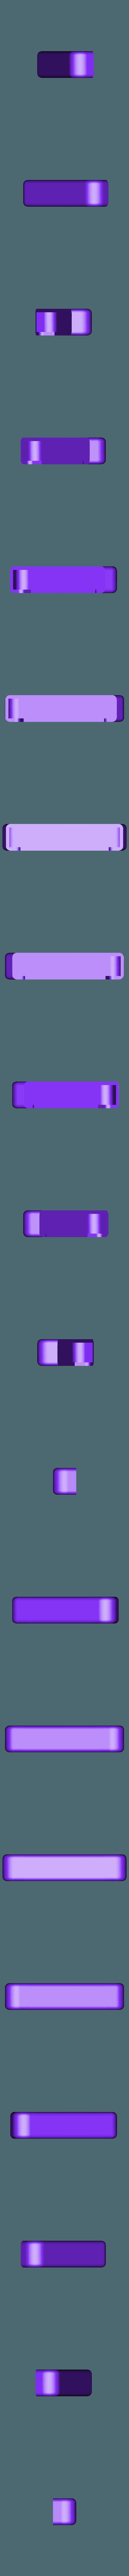 SX Handle v1 v30.stl Download STL file Arduino RaspBerry Pi Rasbian On Site Programmer • 3D printer template, nik101968